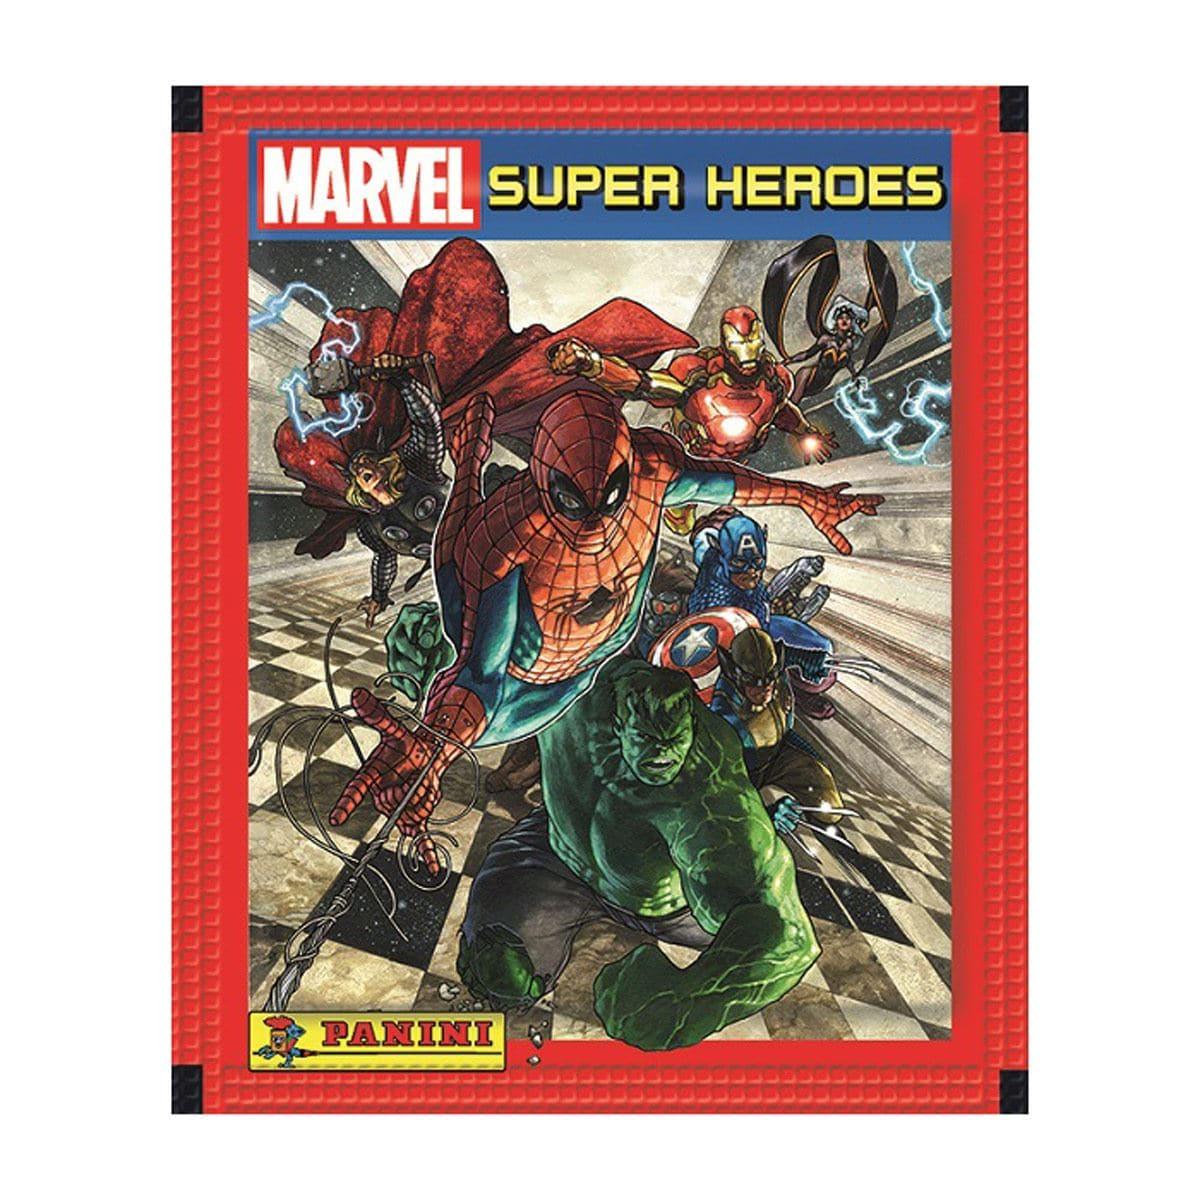 Sobre Marvel 5 estampas Súper Héroes Panini